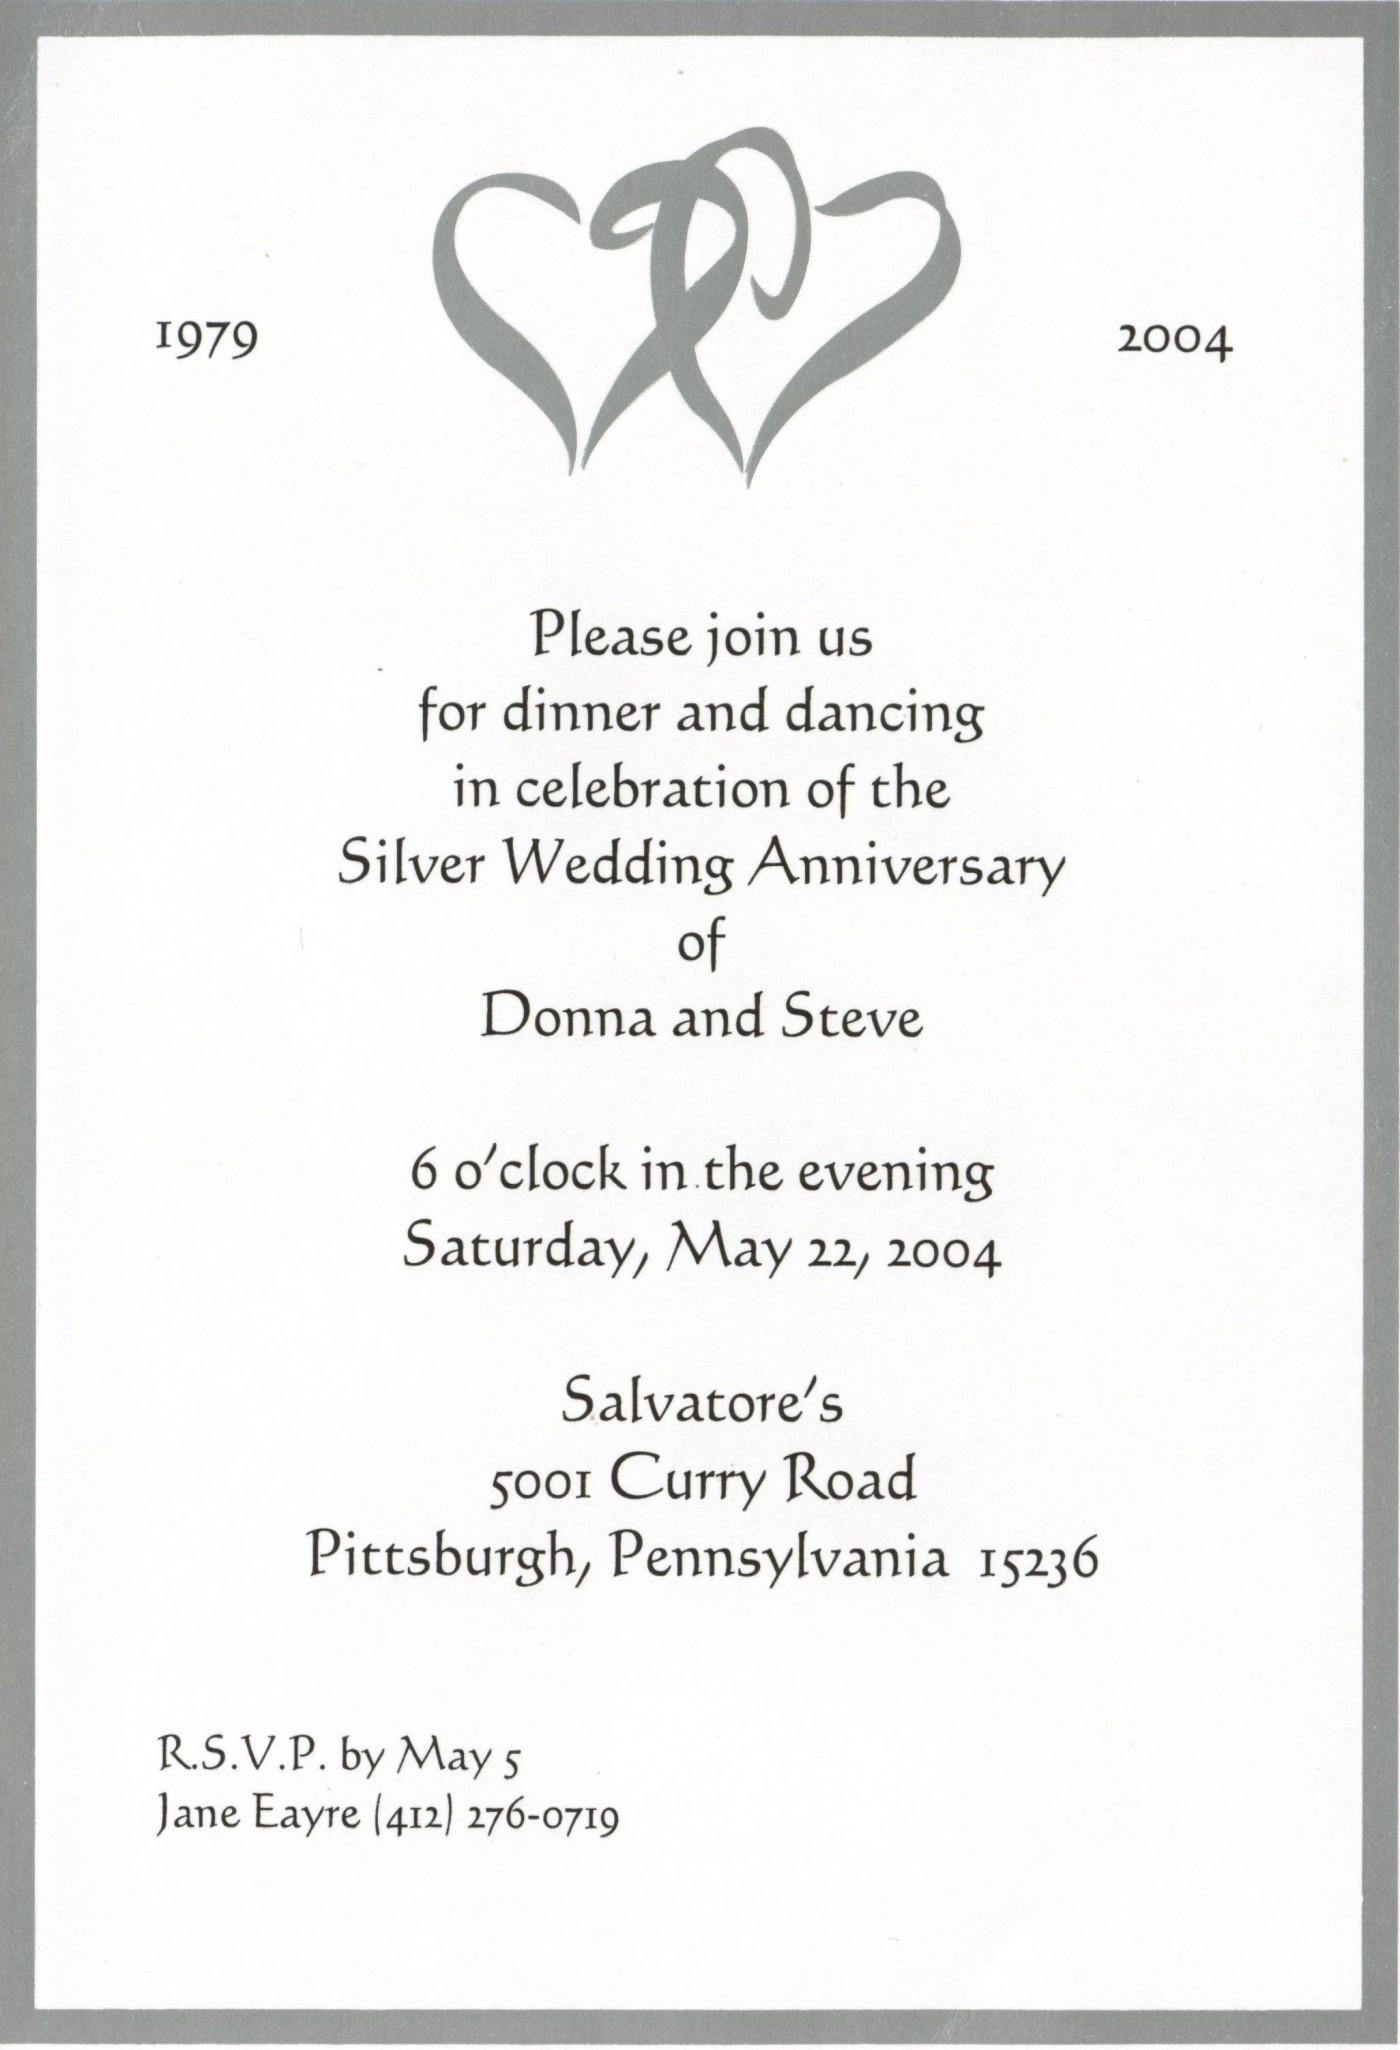 007 Unusual 50th Anniversary Invitation Template Image  Wedding Microsoft Word Free Download1400